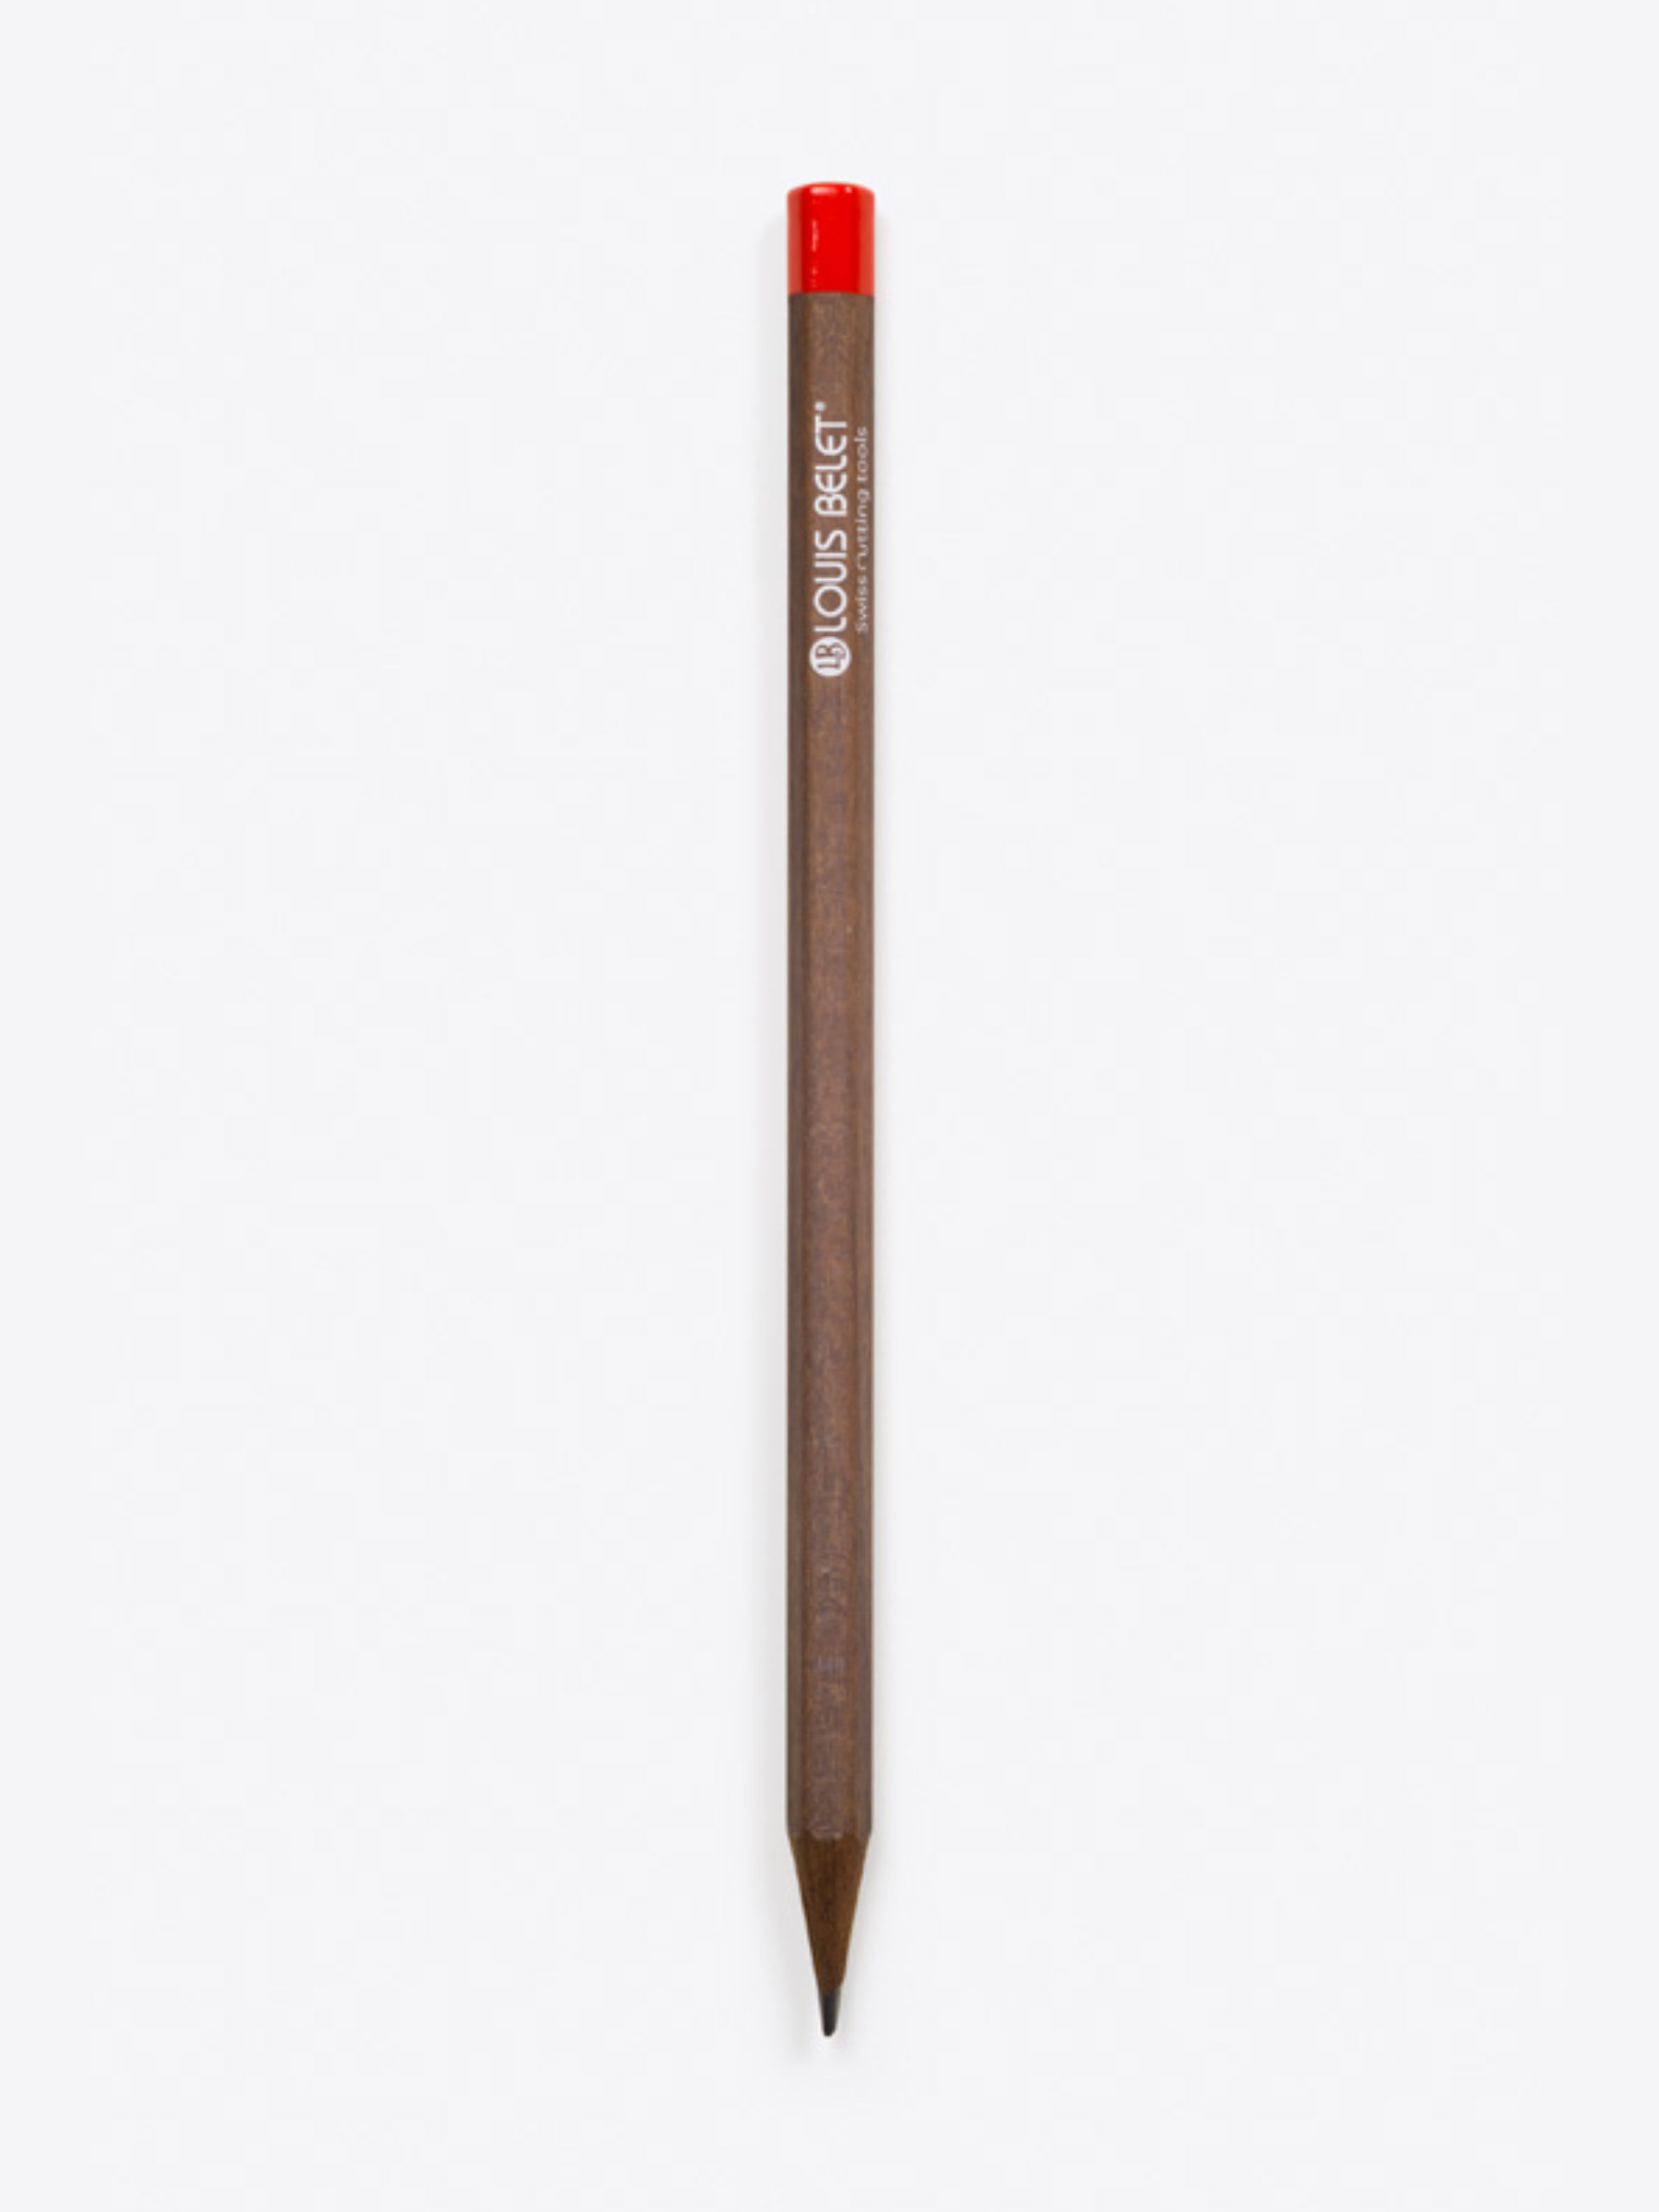 Caran Dache Bleistift Swiss Wood Mit Logo Bedrucken